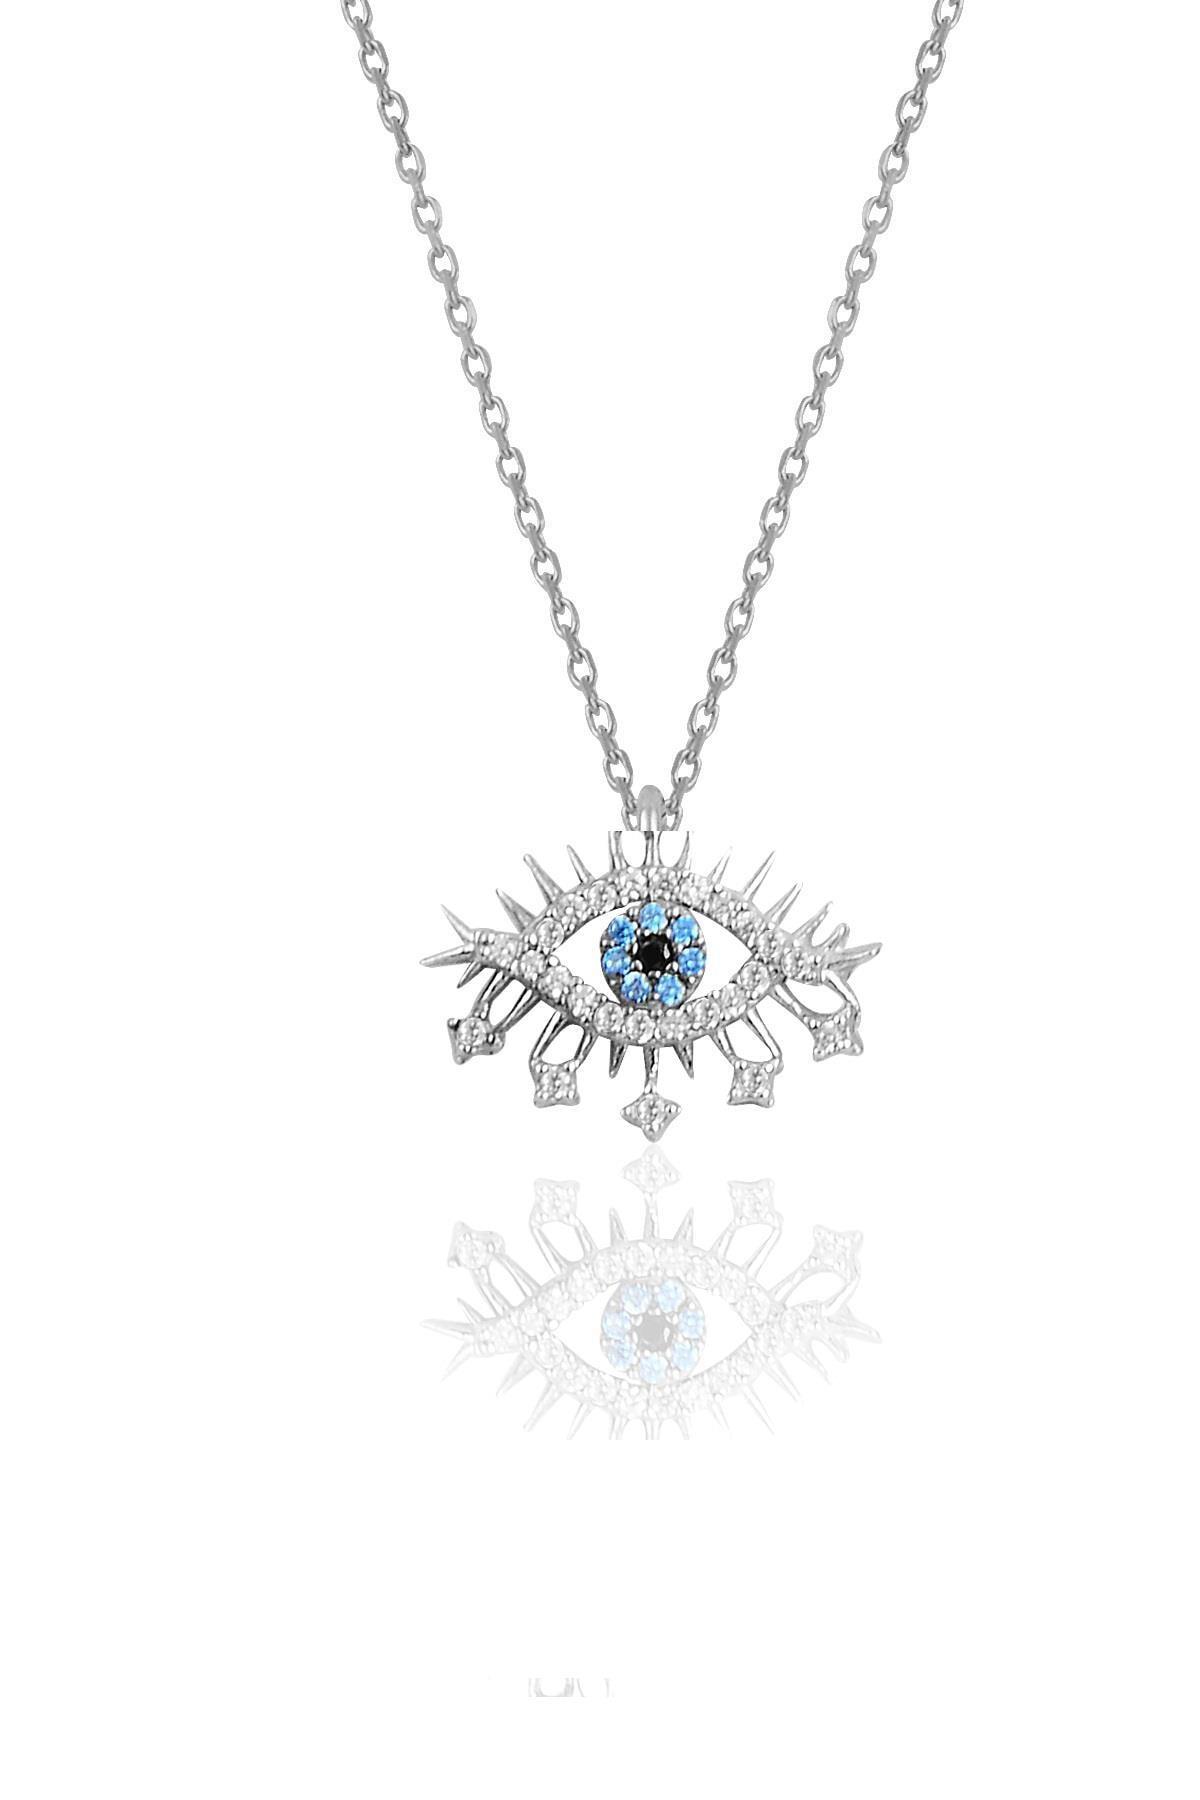 Söğütlü Silver Gümüş rodyumlu zirkon taşlı lareyn kolye küpe ve yüzük gümüş set 1